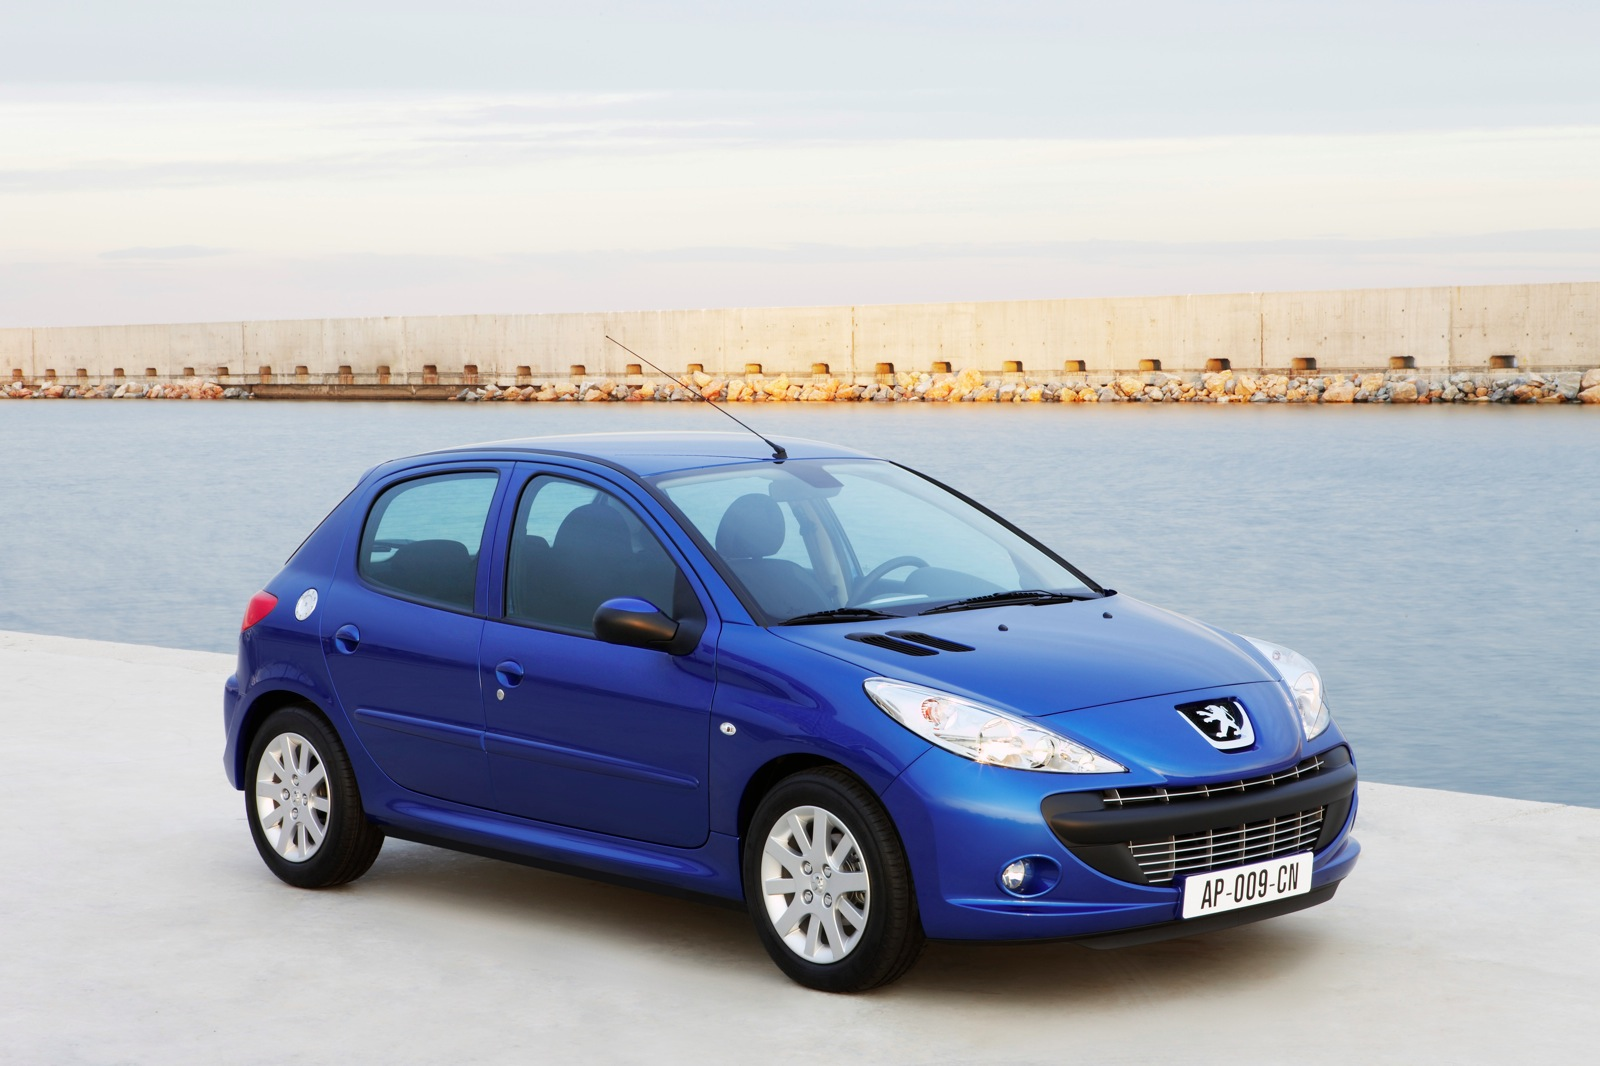 peugeot 206+ 5 doors specs - 2009, 2010, 2011, 2012 - autoevolution